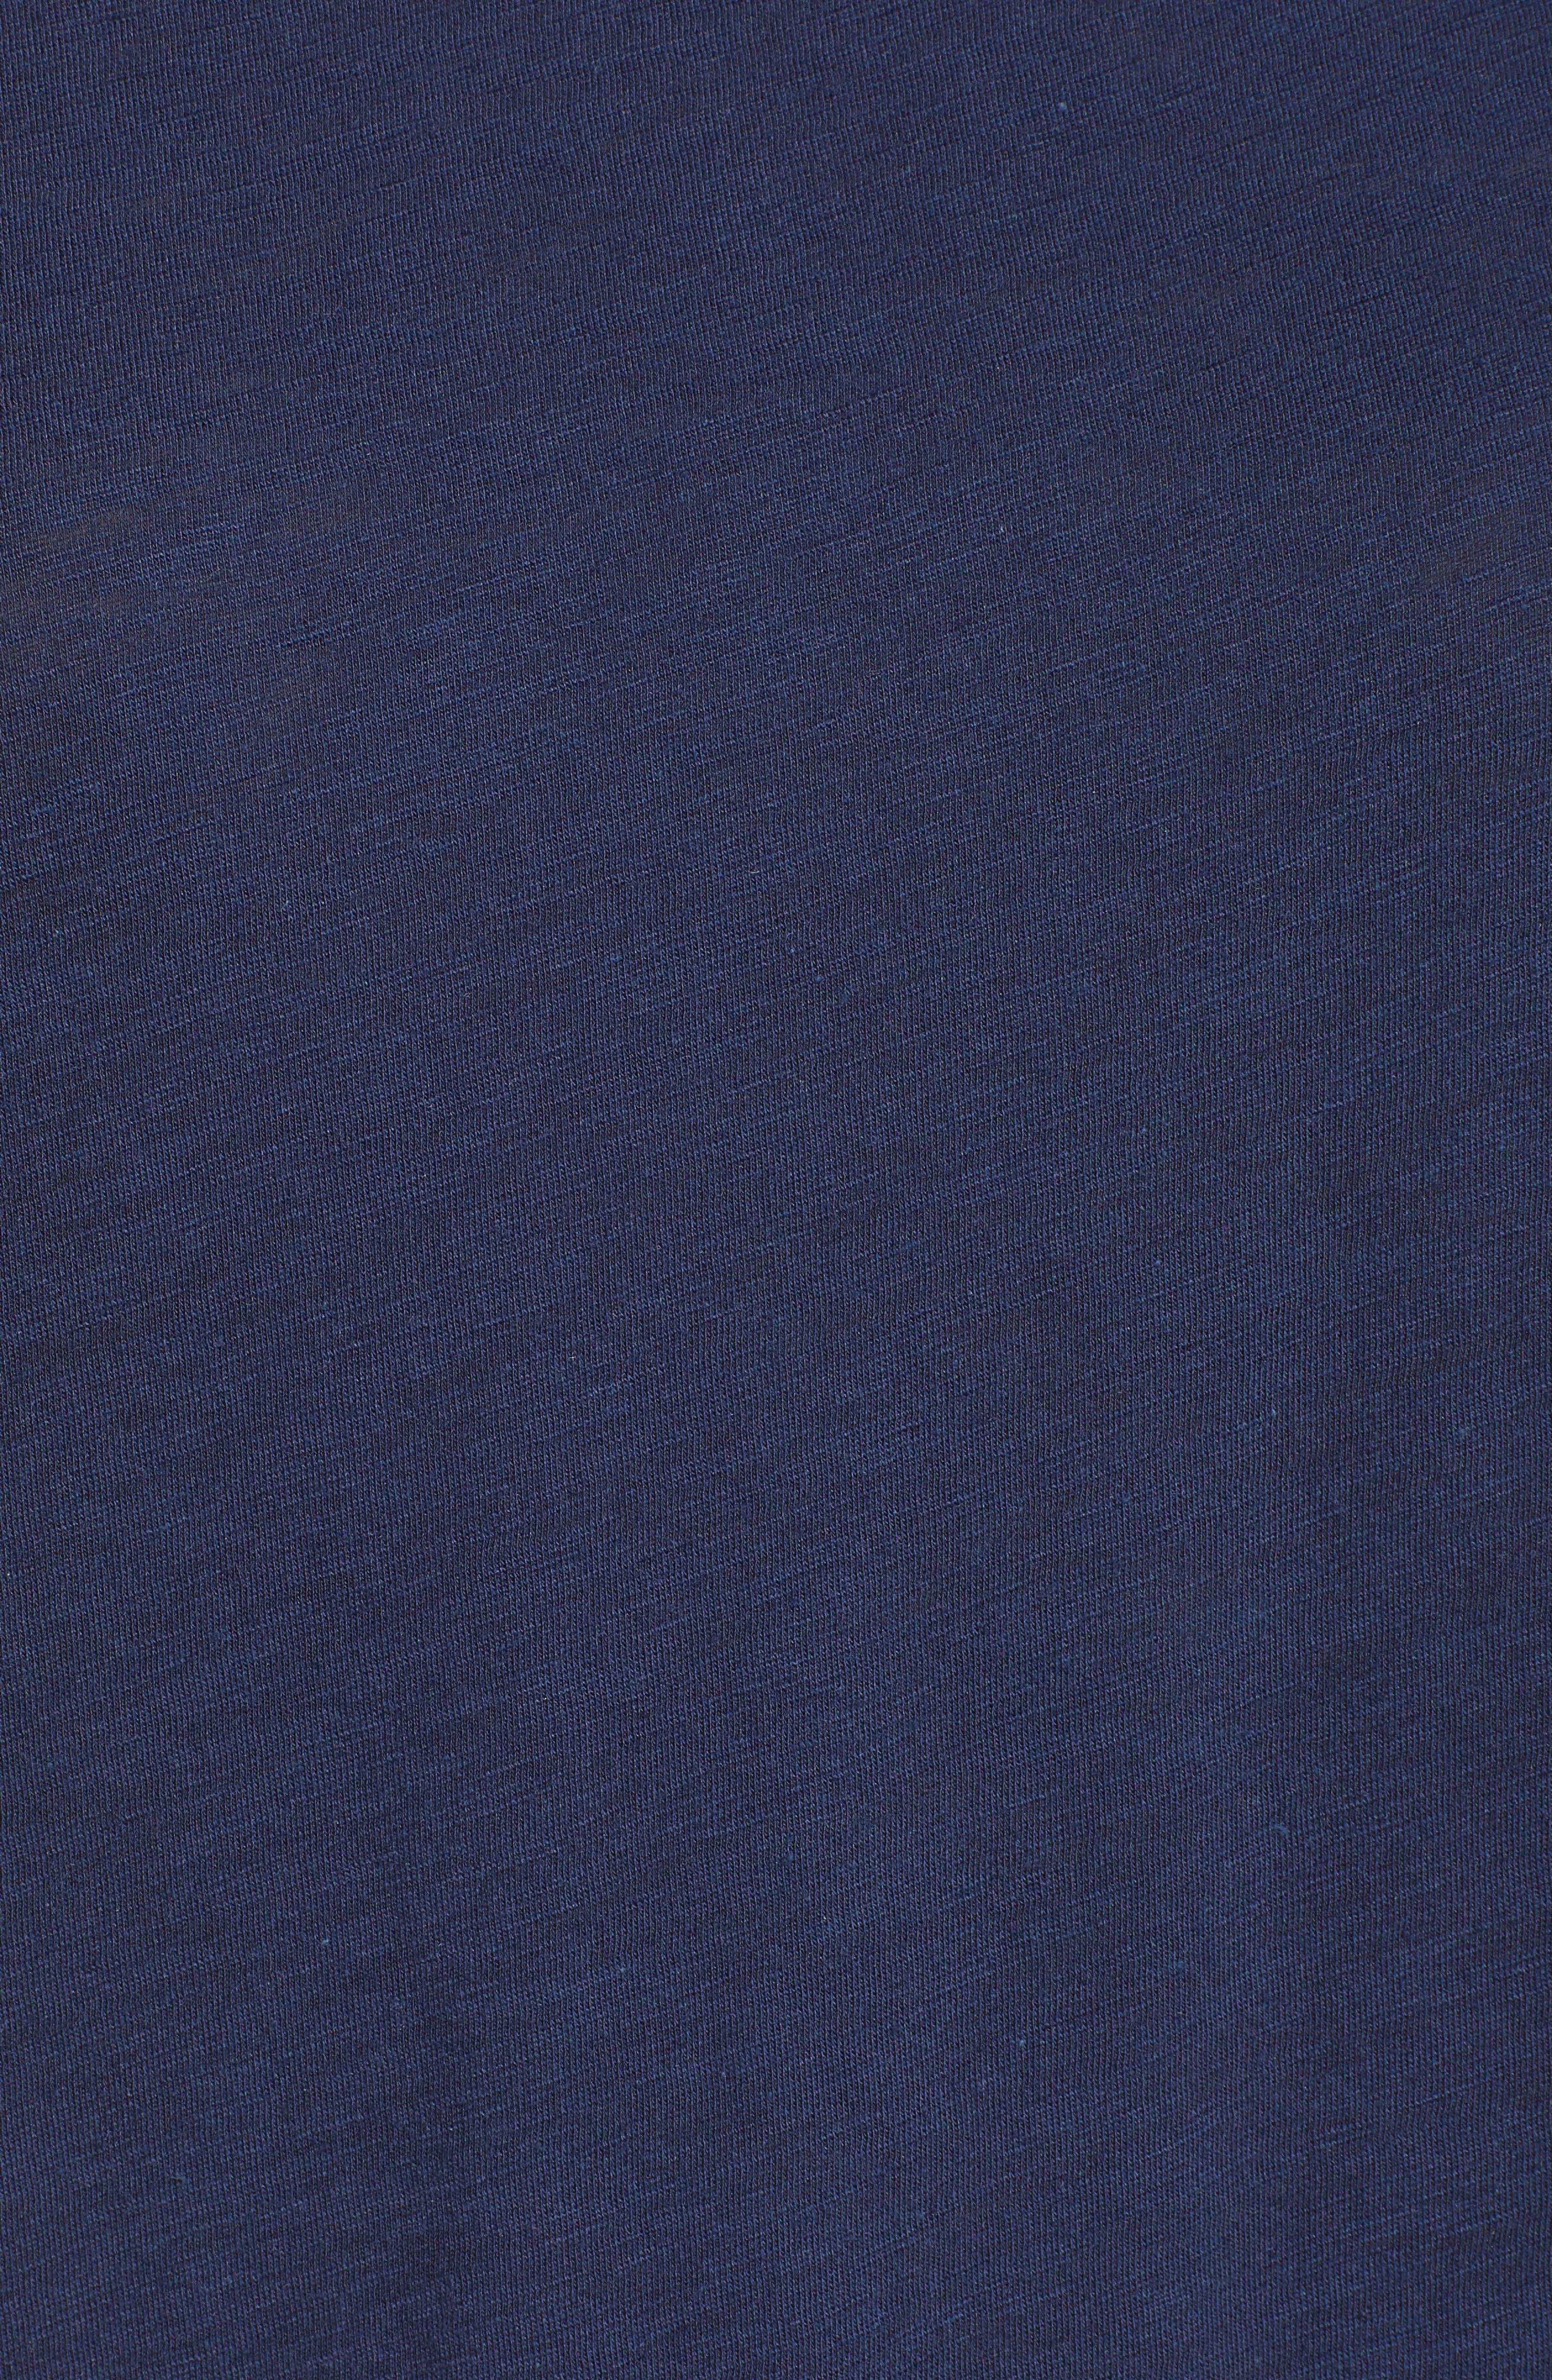 Stripe Sleeve Cotton Blend Athletic Tee,                             Alternate thumbnail 20, color,